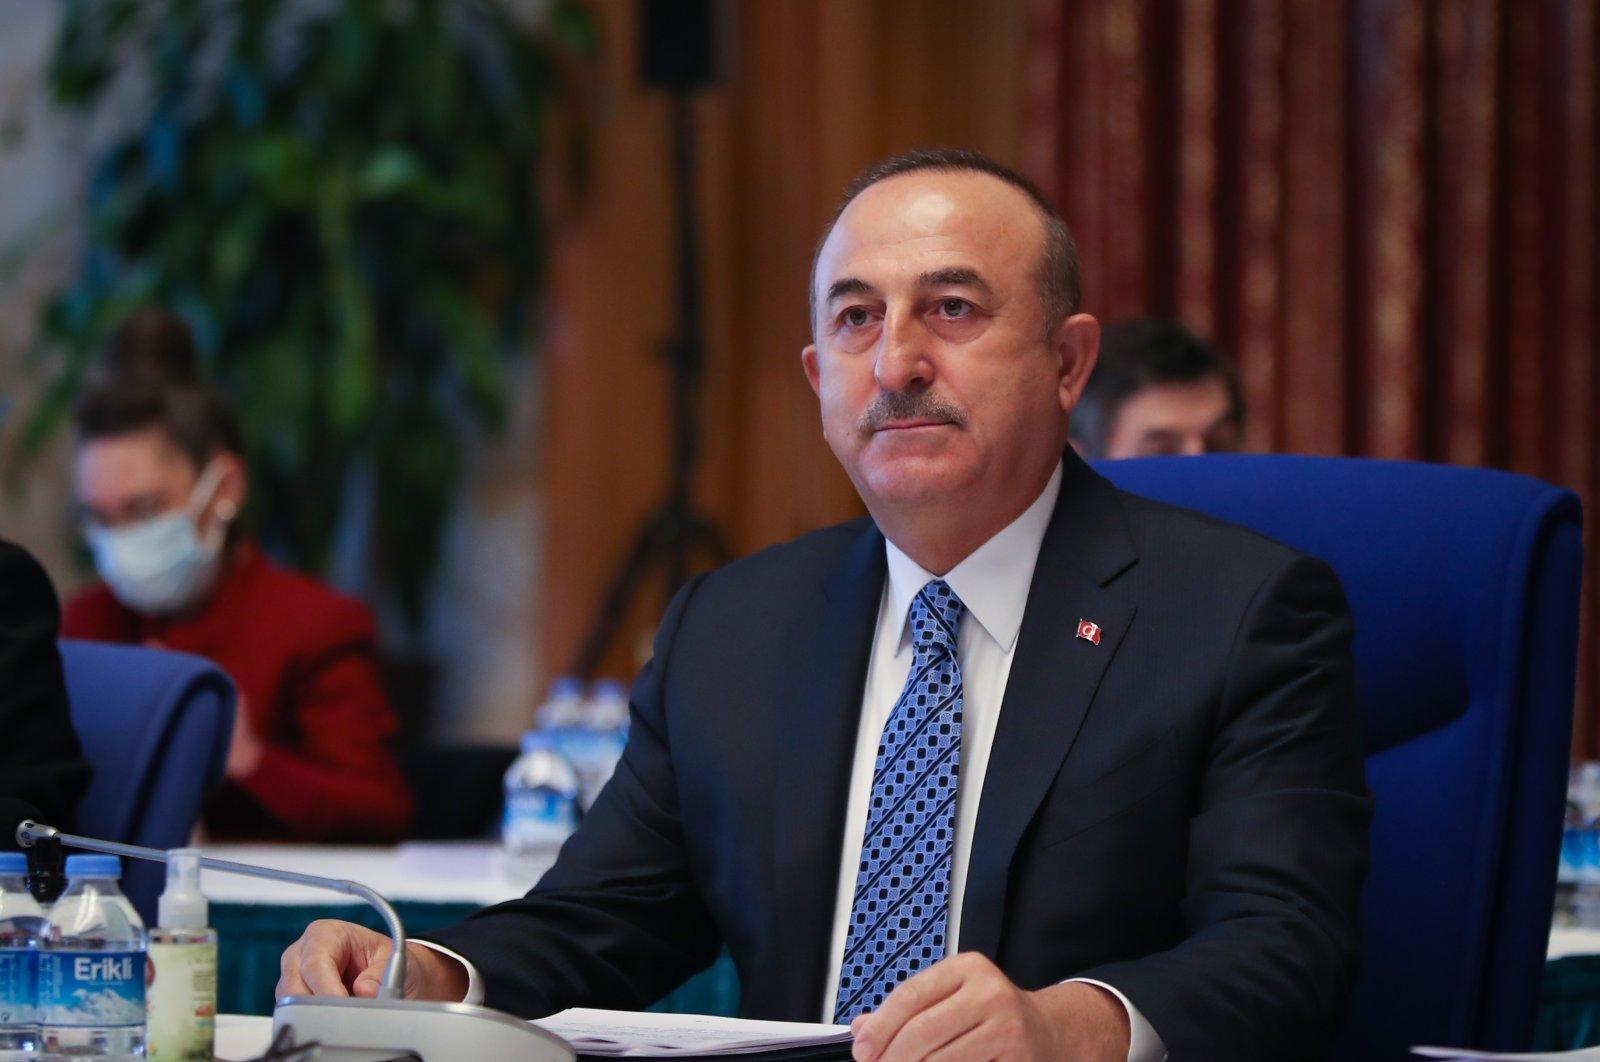 Foreign Minister Çavuşoğlu listens during a parliamentary budgetary commission meeting in Ankara, Nov. 24, 2020. (AA Photo)